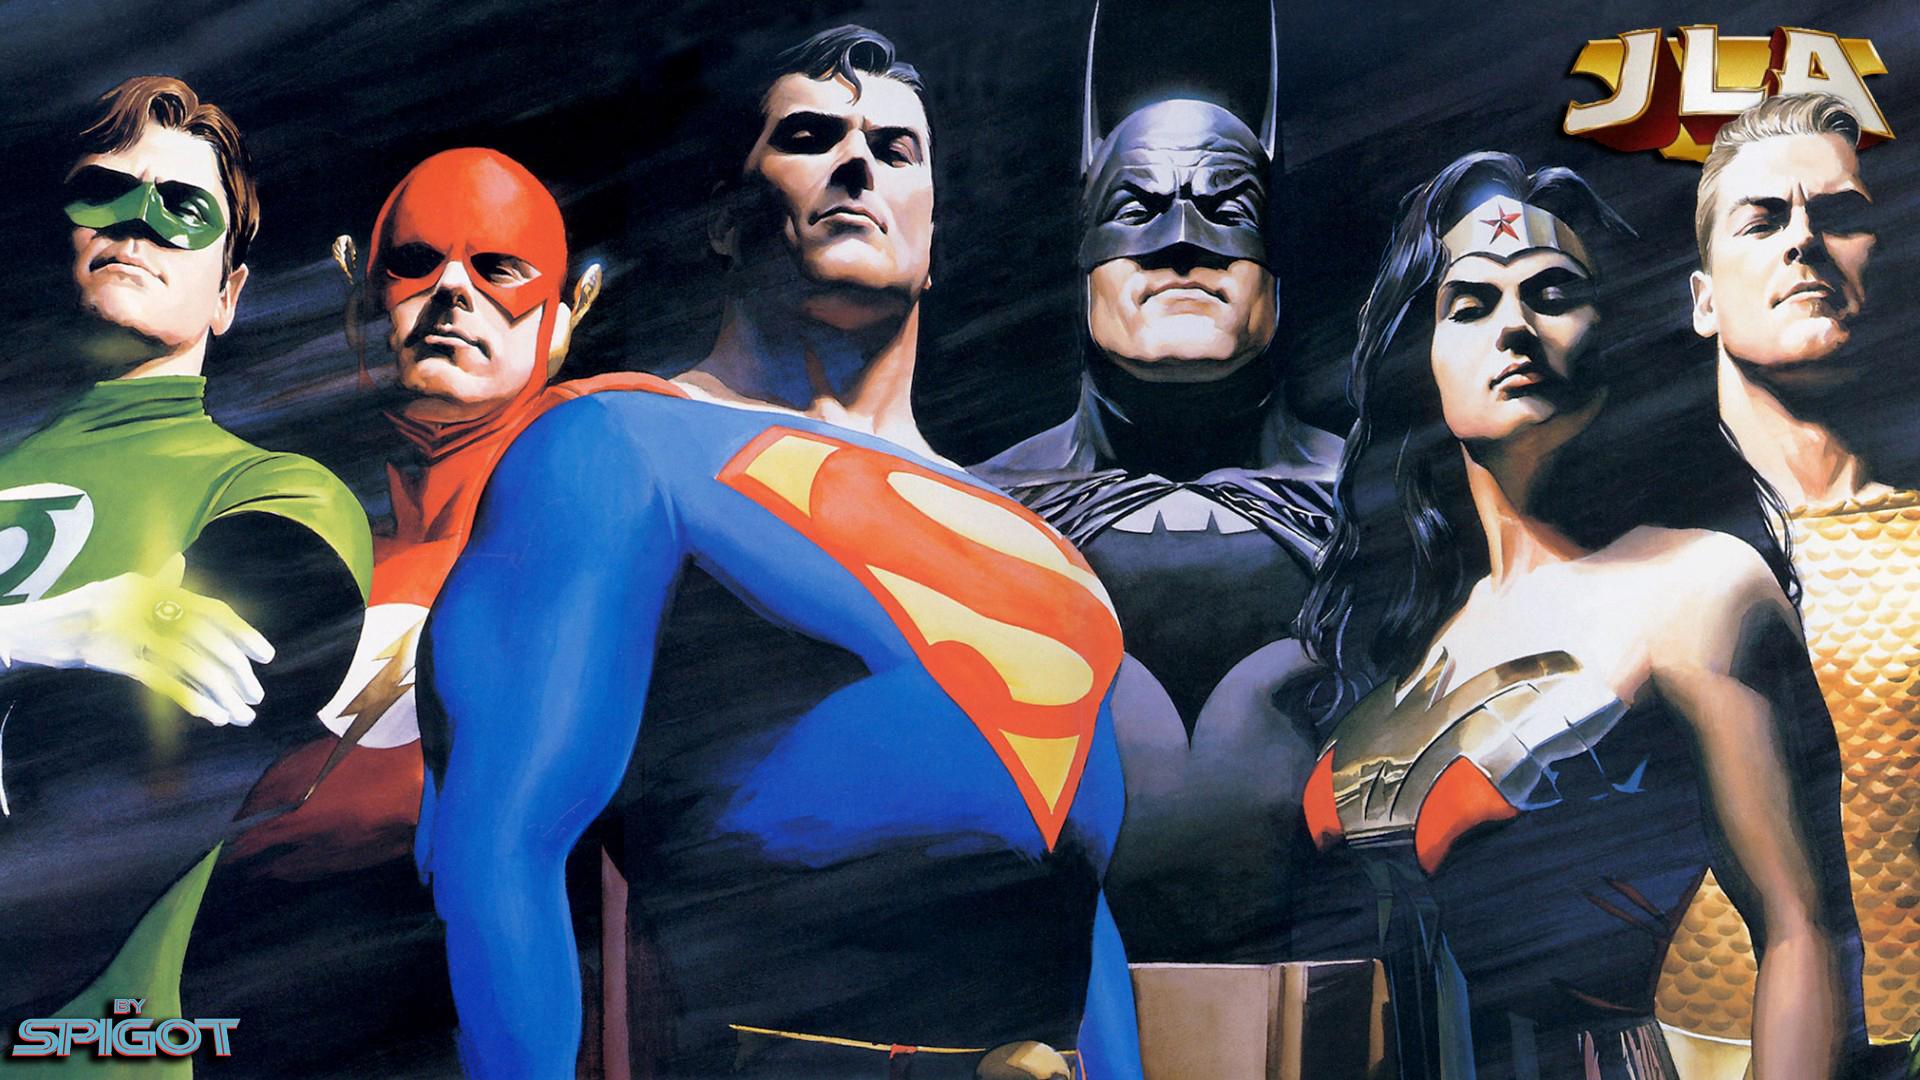 Justice League Wallpaper George Spigot S Blog